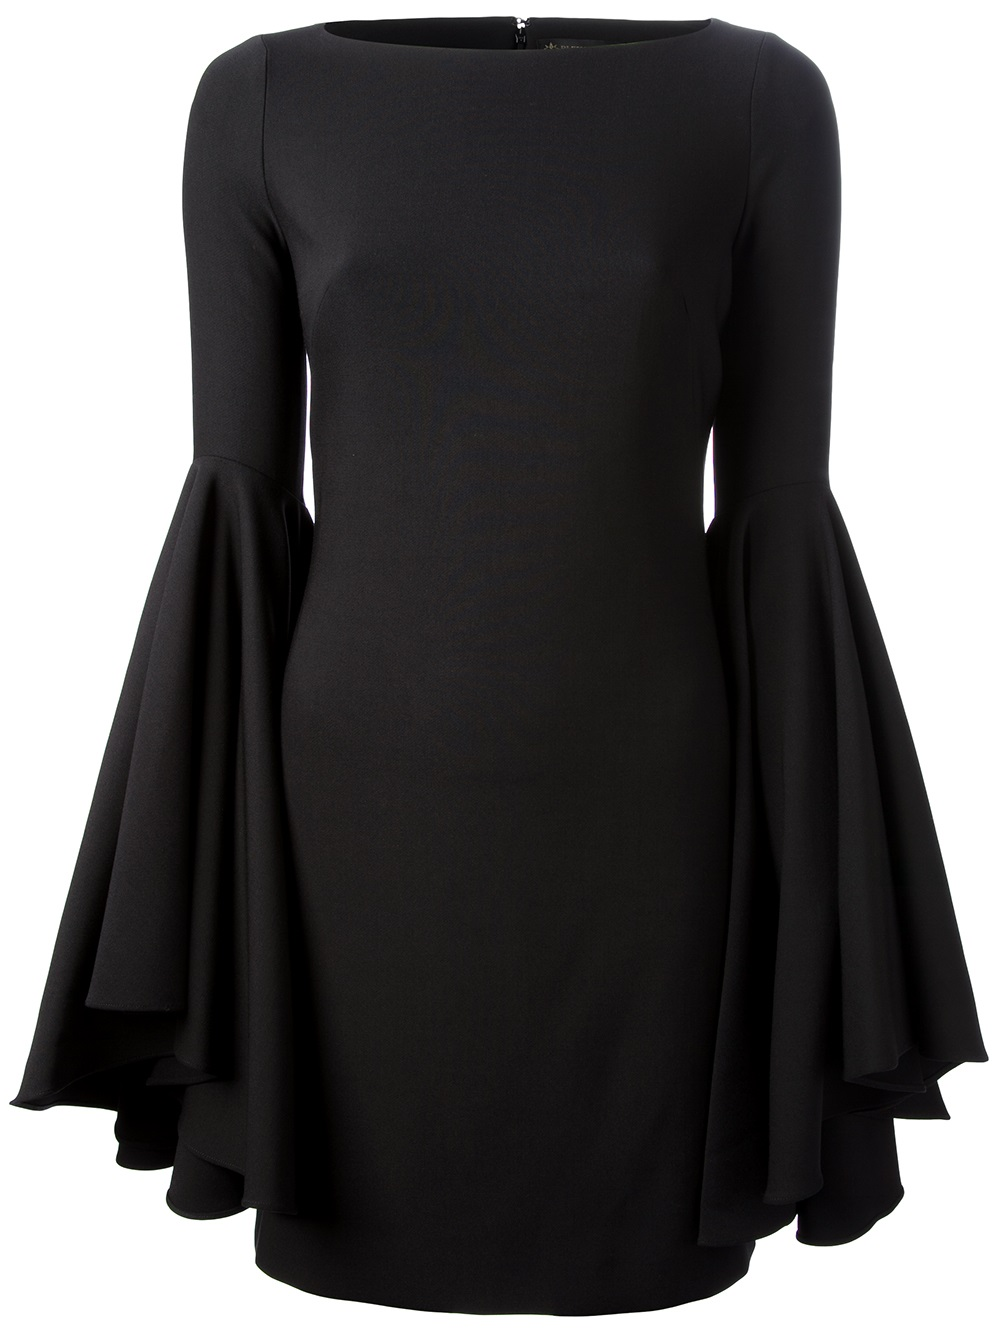 Lyst Plein Sud Flared Sleeve Dress In Black